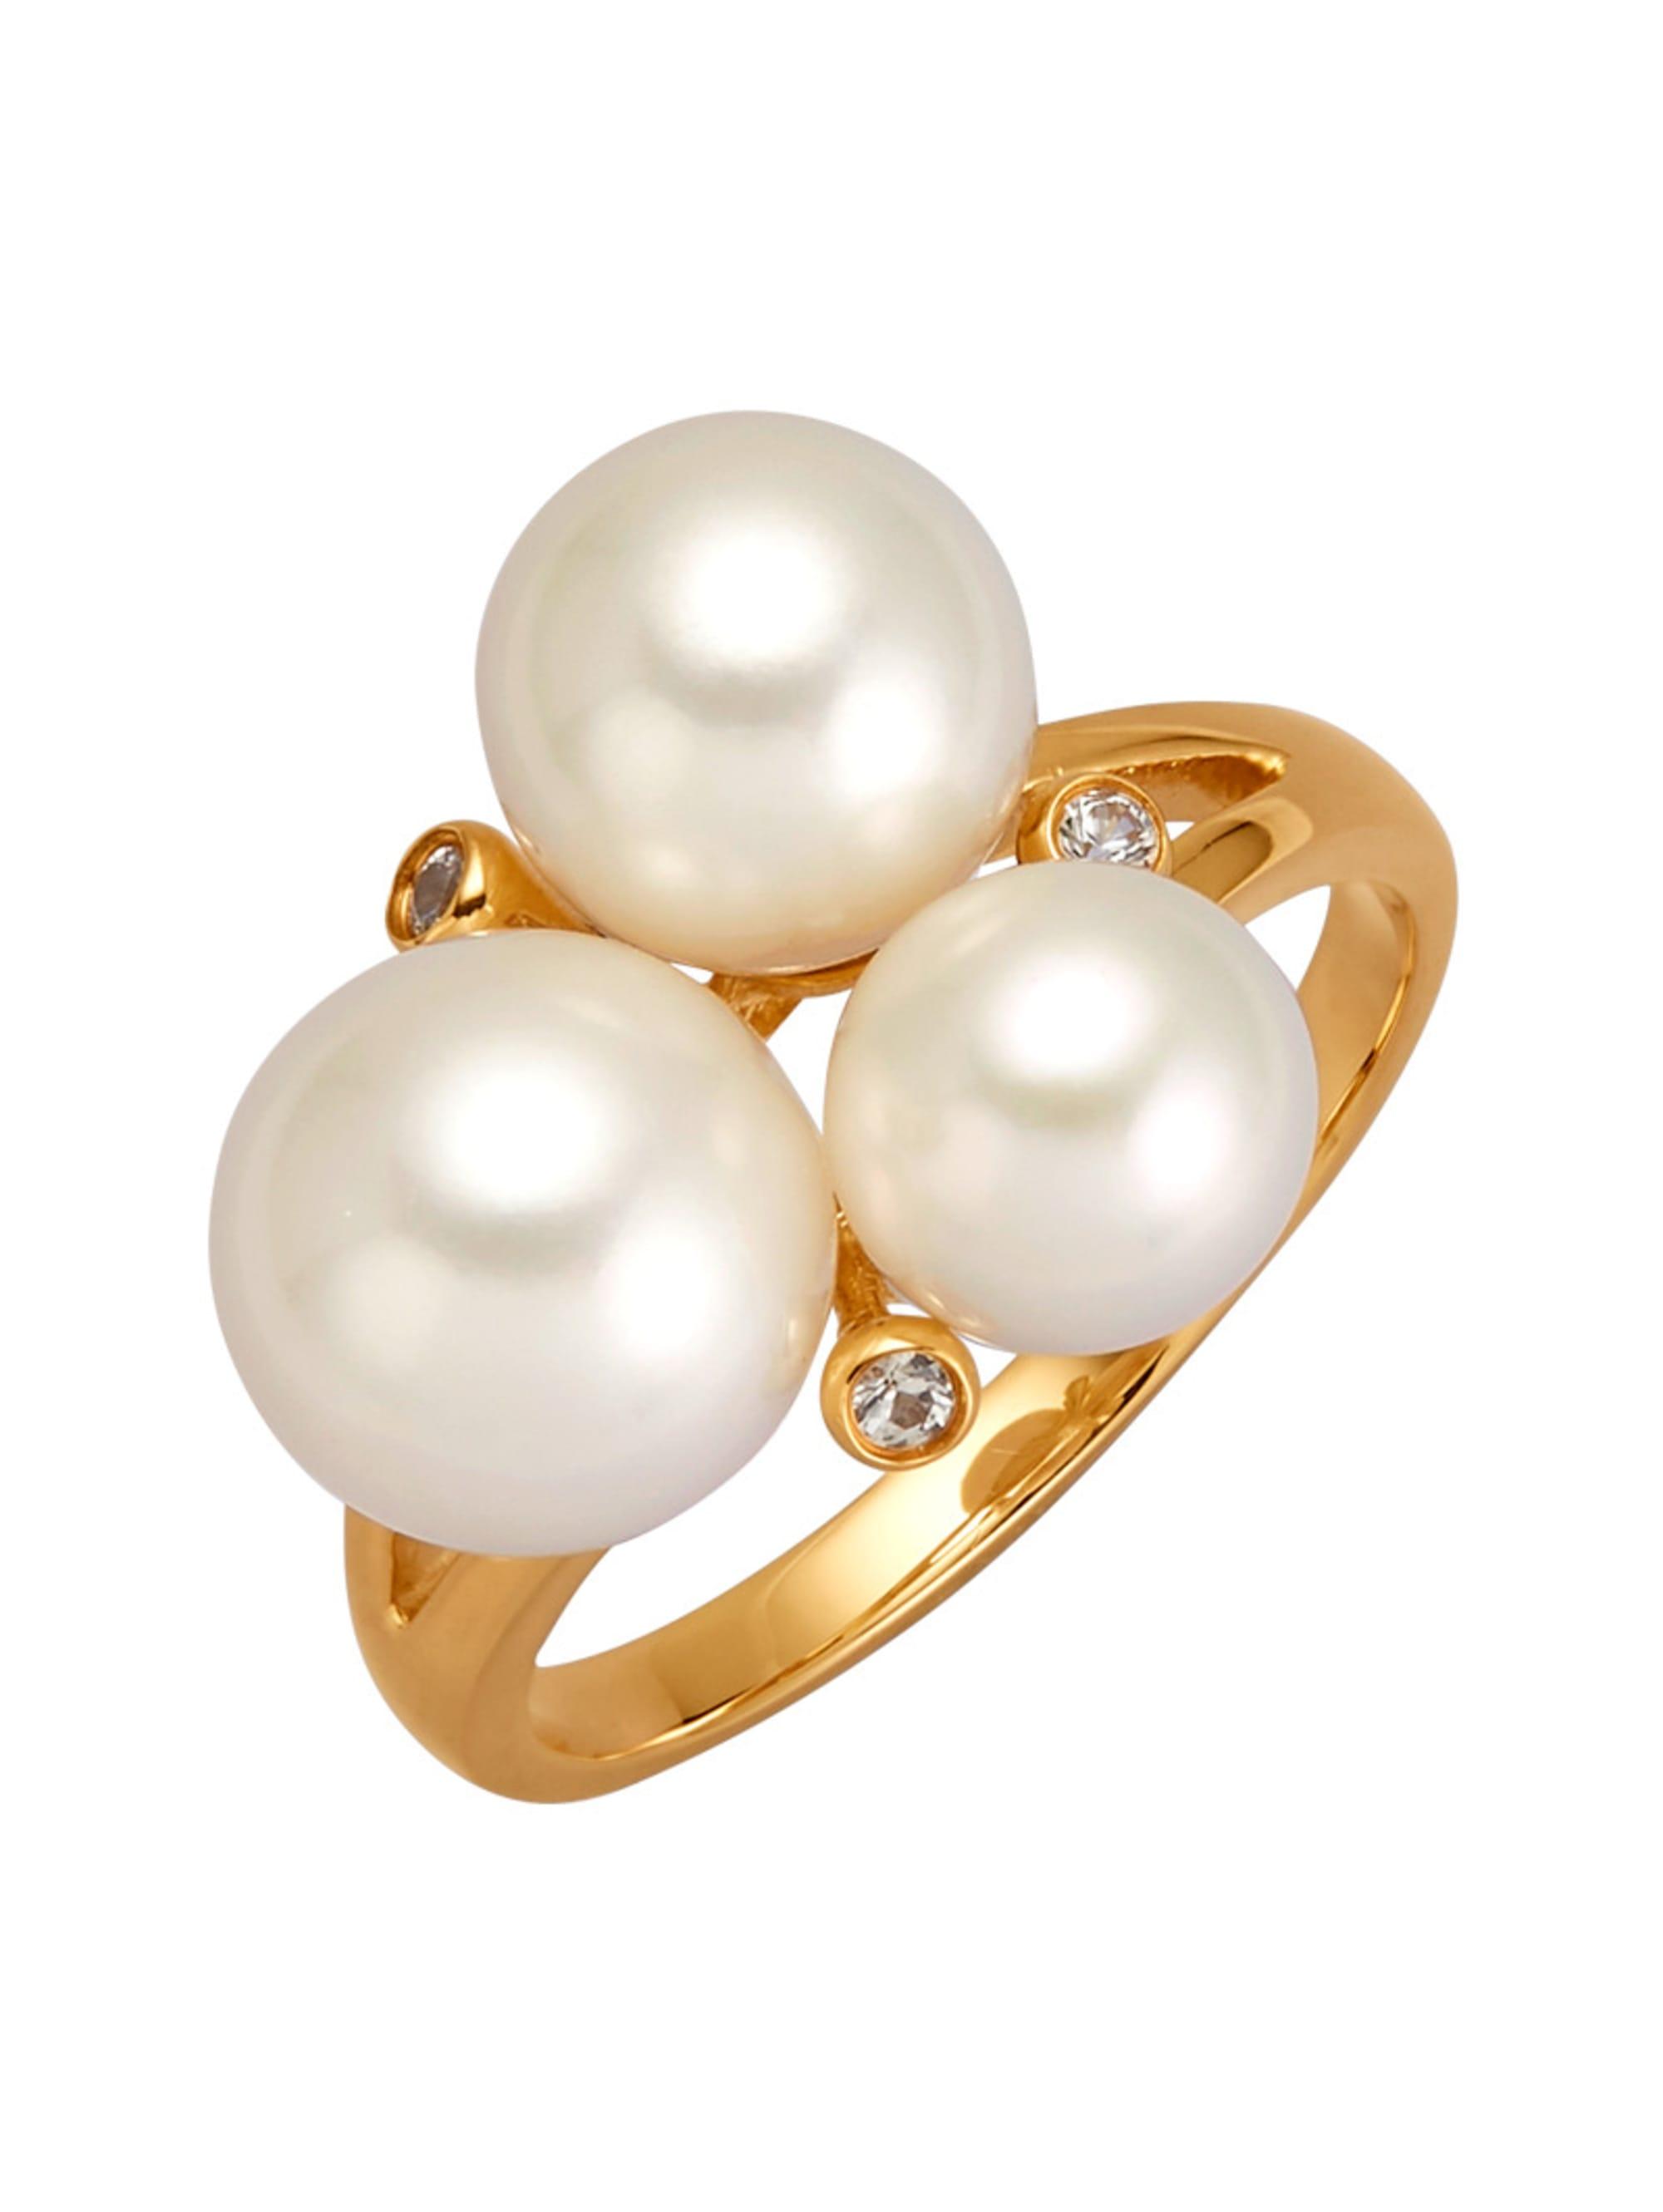 Diemer Perle Damenring mit Akoya-Zuchtperlen 7a4eO